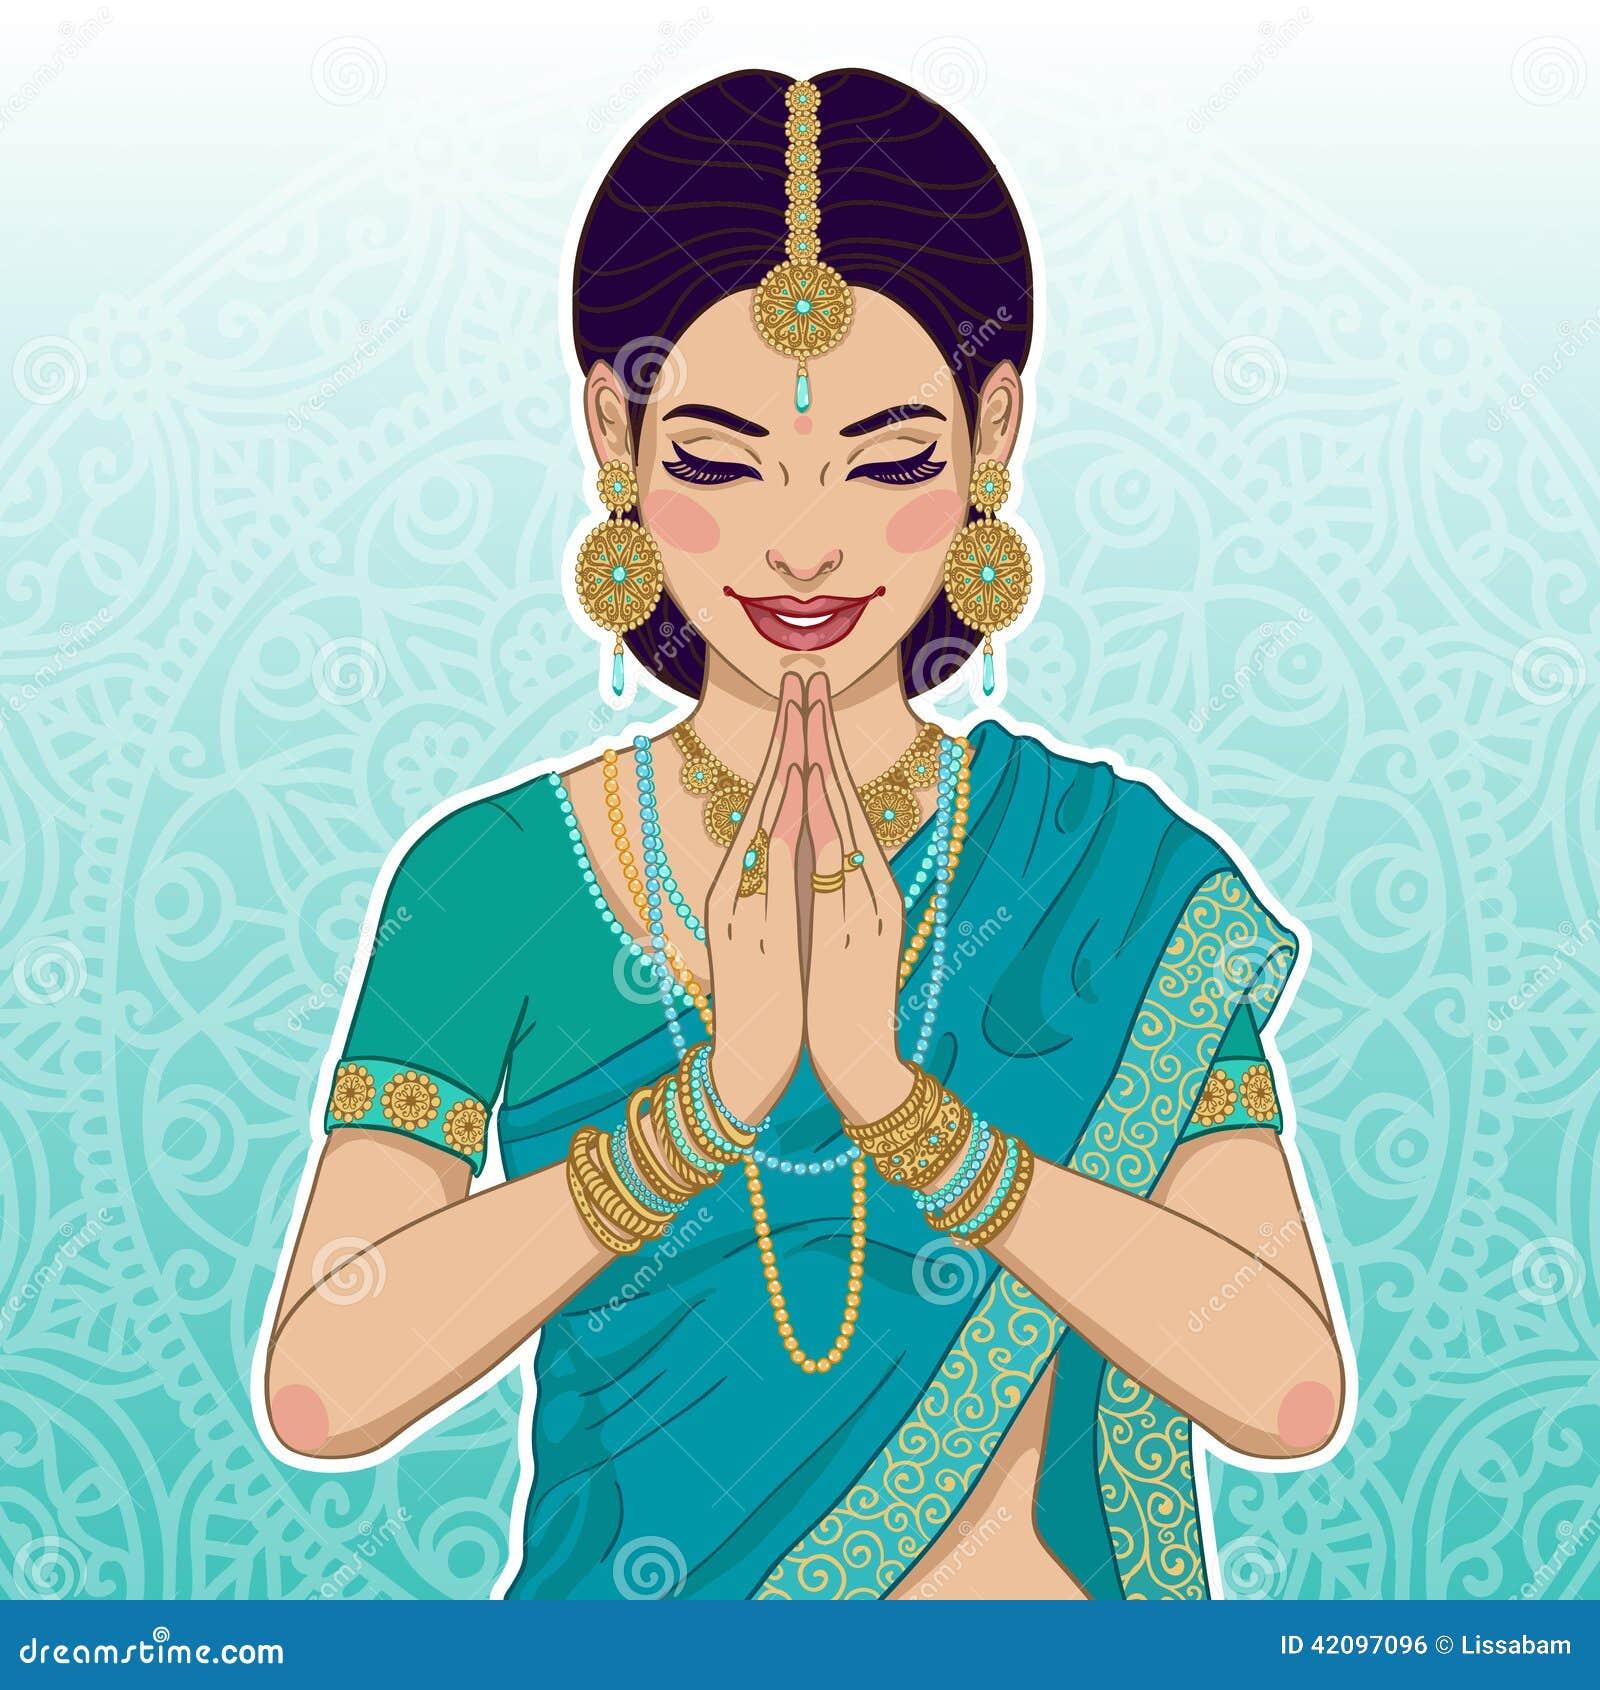 mulher-indiana-bonita-que-diz-o-namaste-42097096.jpg